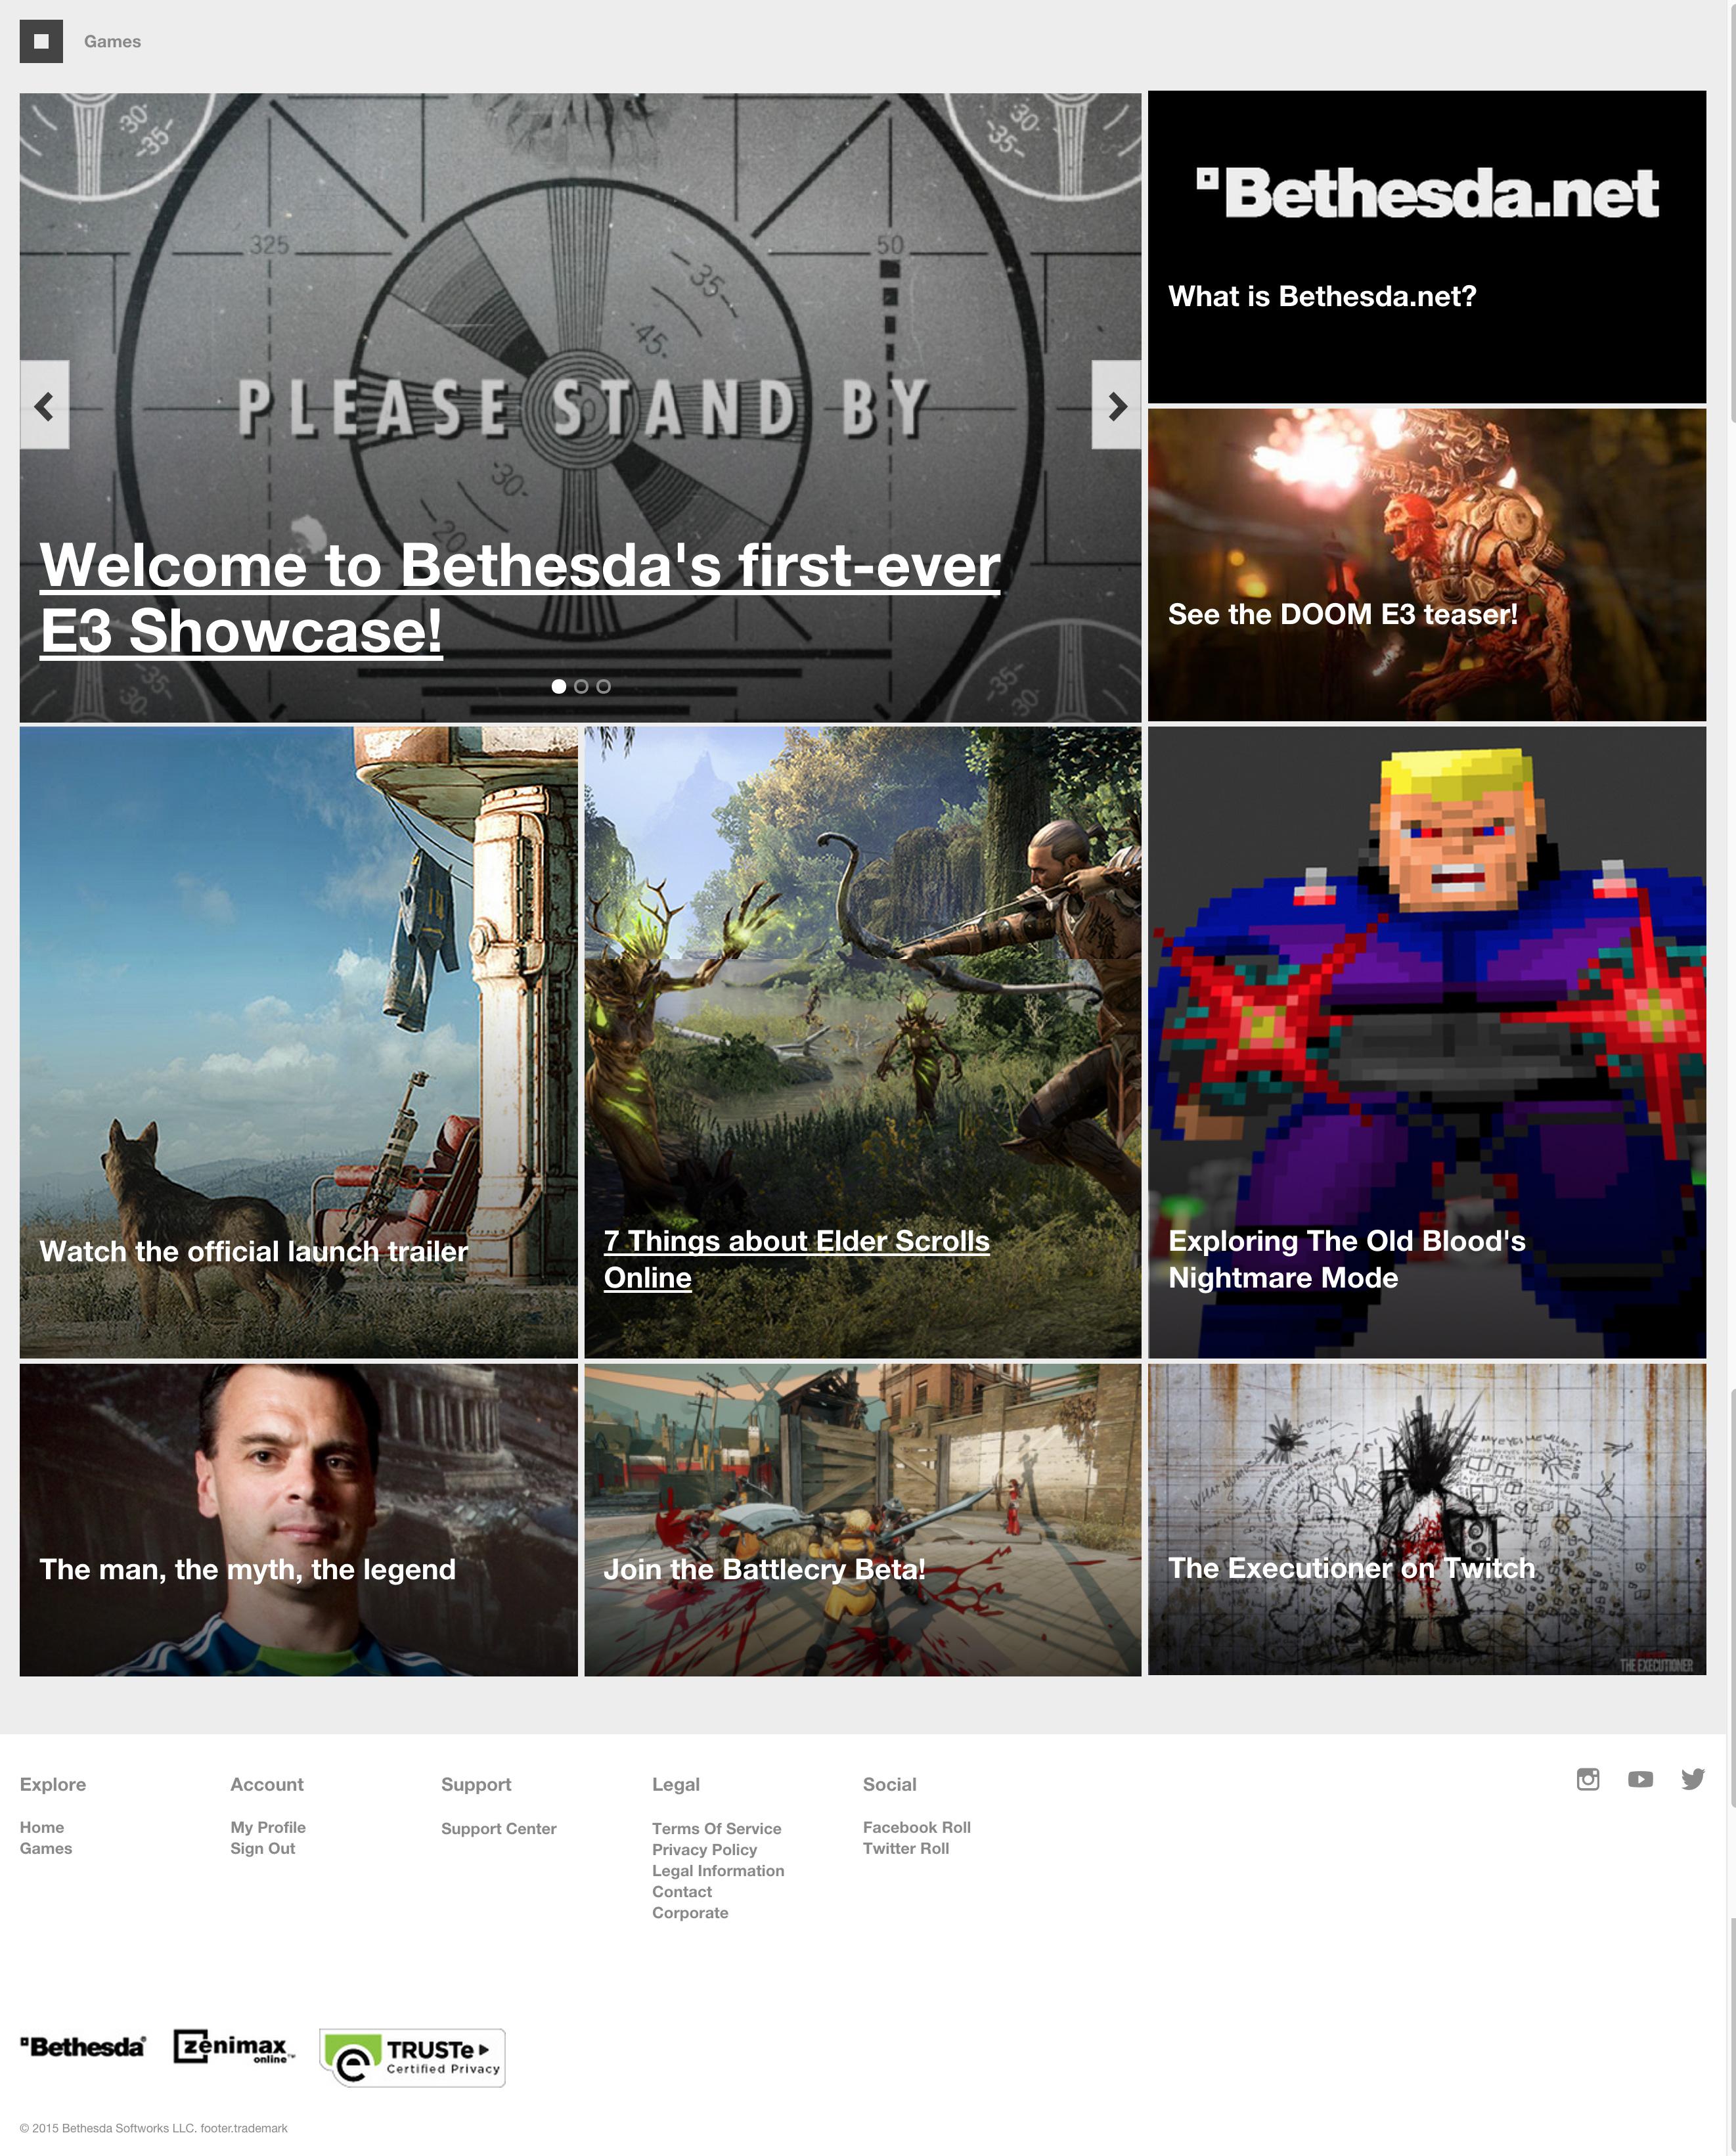 Bethesdanet_dashboard